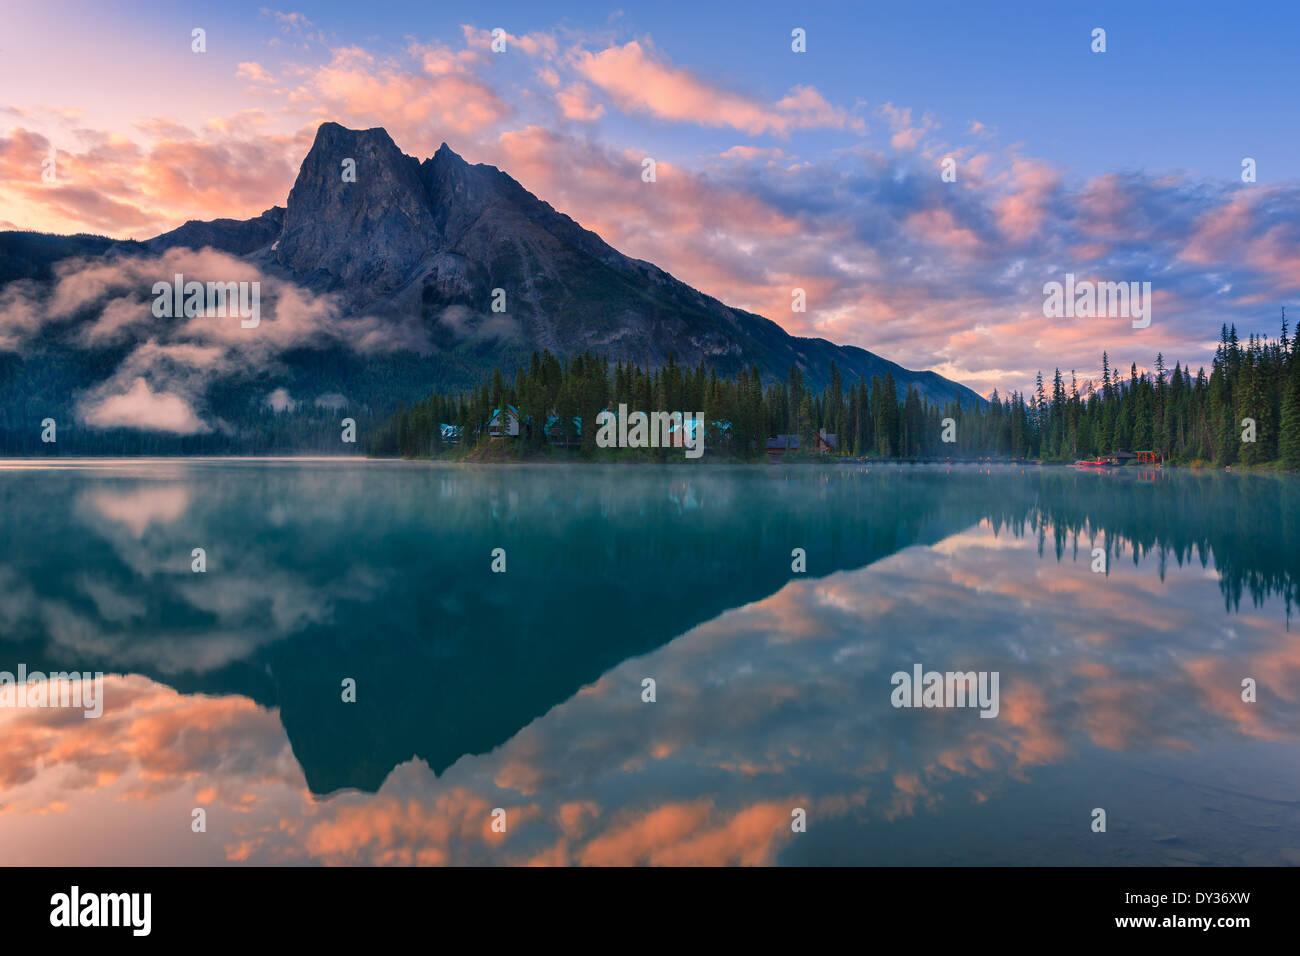 Sunrise Emerald Lake im Yoho Nationalpark, Britisch-Kolumbien, Kanada Stockbild